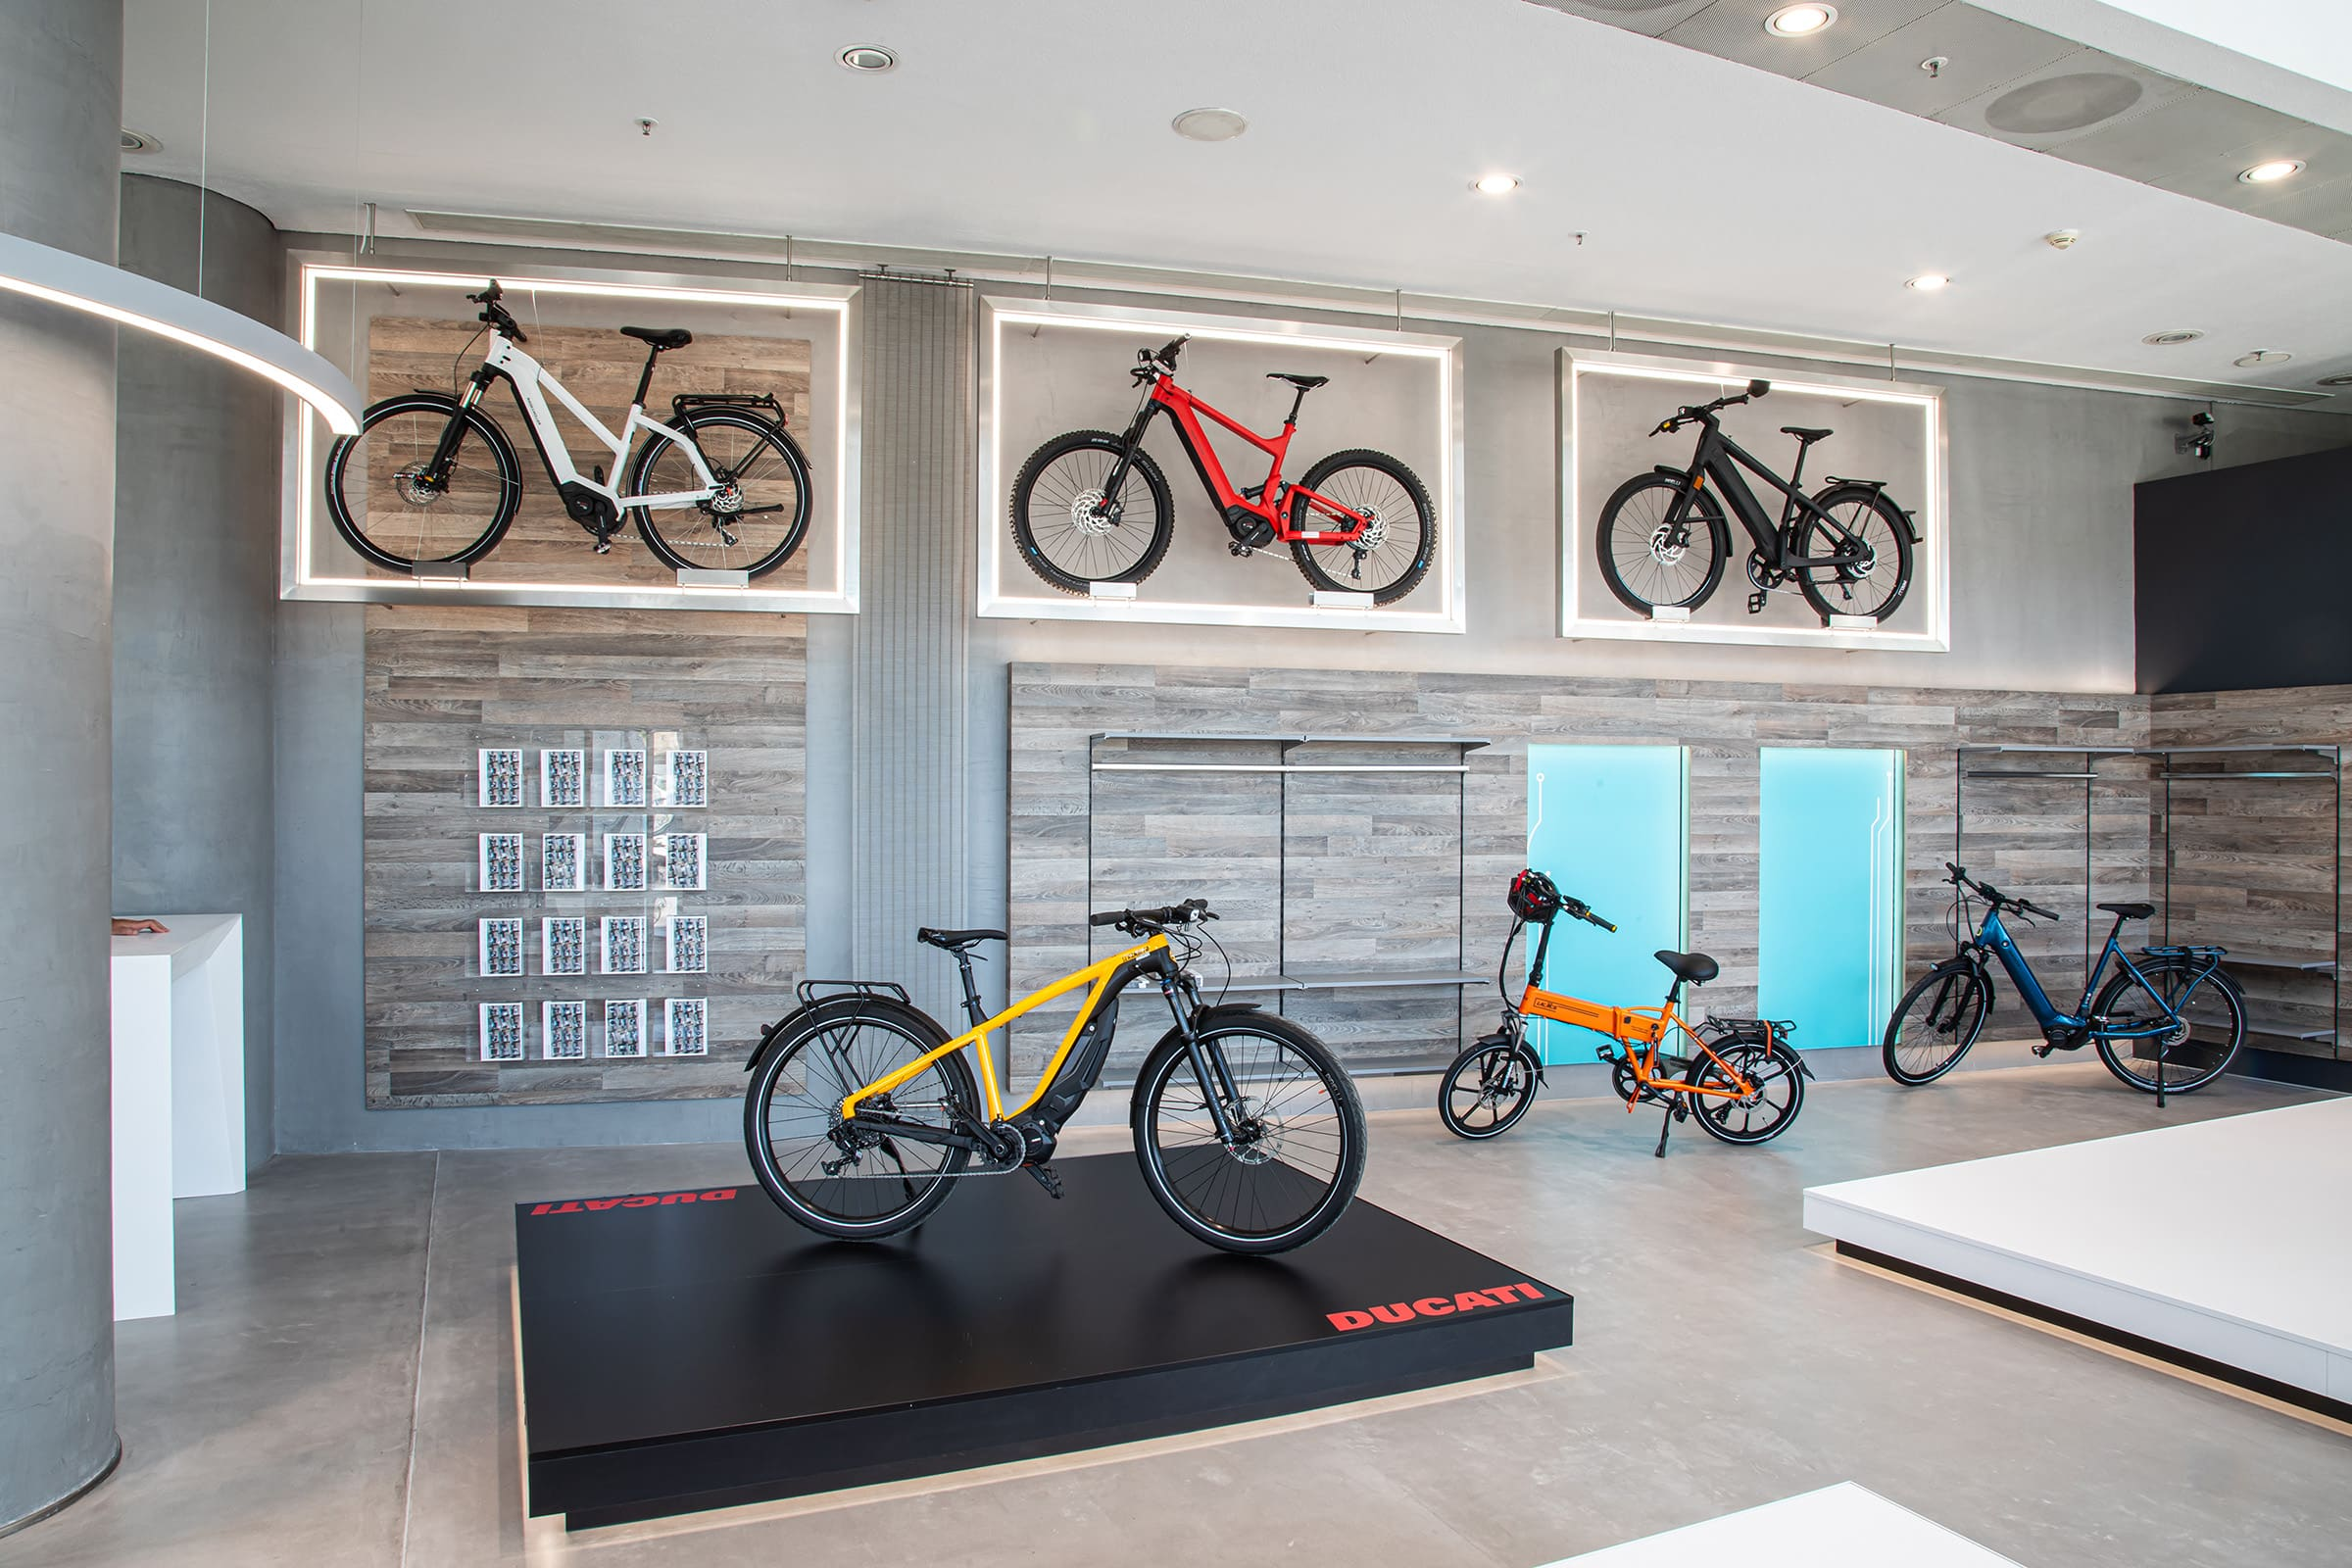 Kosmoride e-Bikes experience store - Έκθεση ηλεκτρικών ποδηλάτων - Κατάστημα στο Μαρούσι